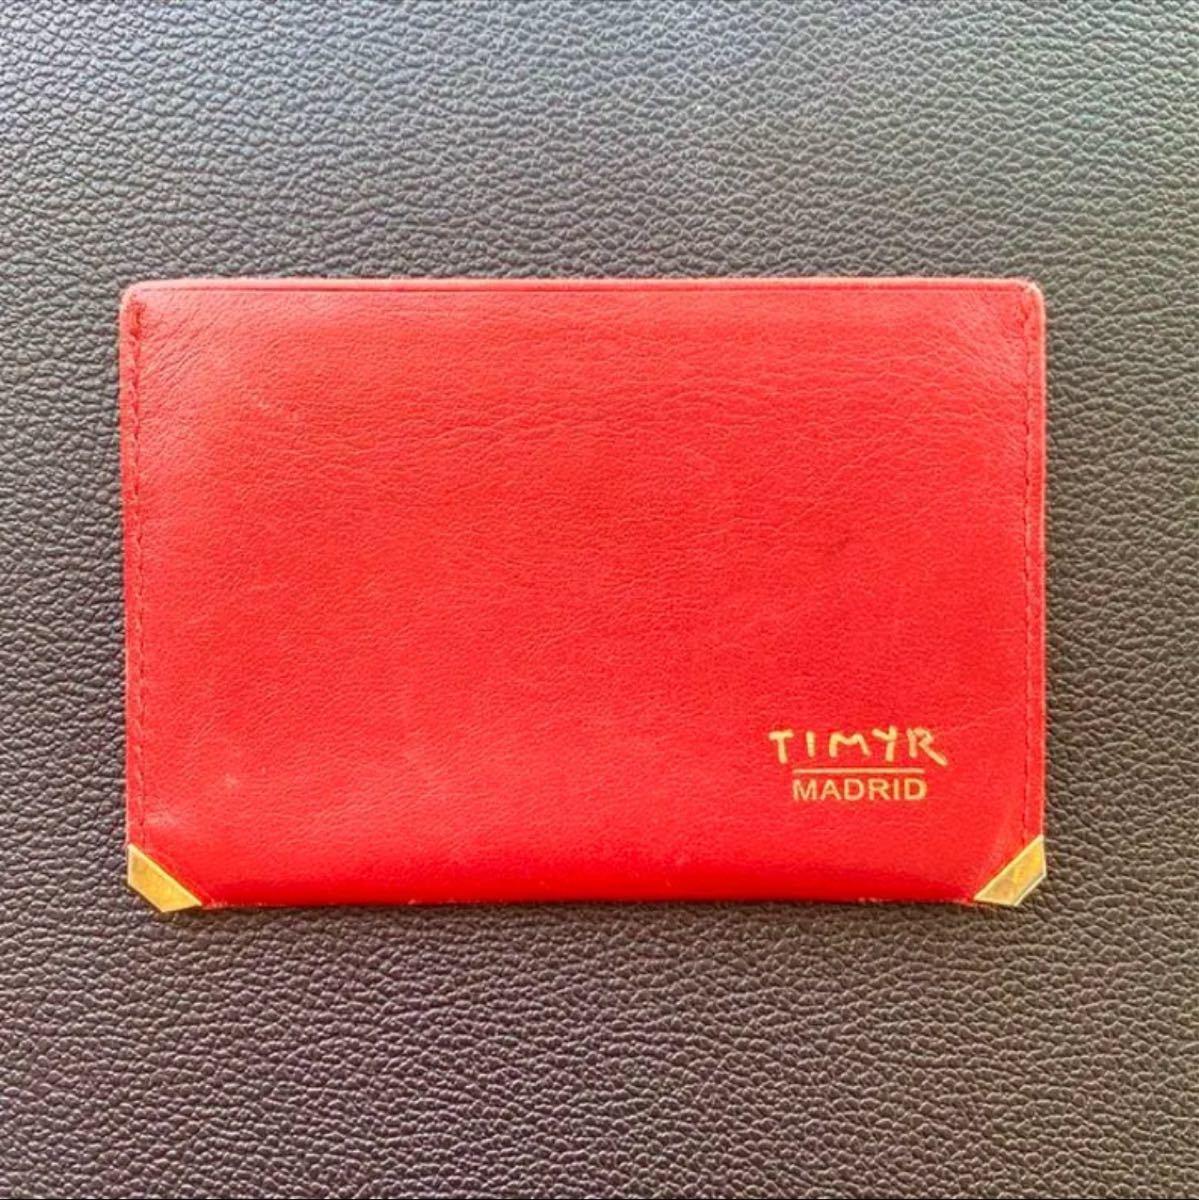 TIMYR MADRID 名刺入れ/定期入れ/カードケース